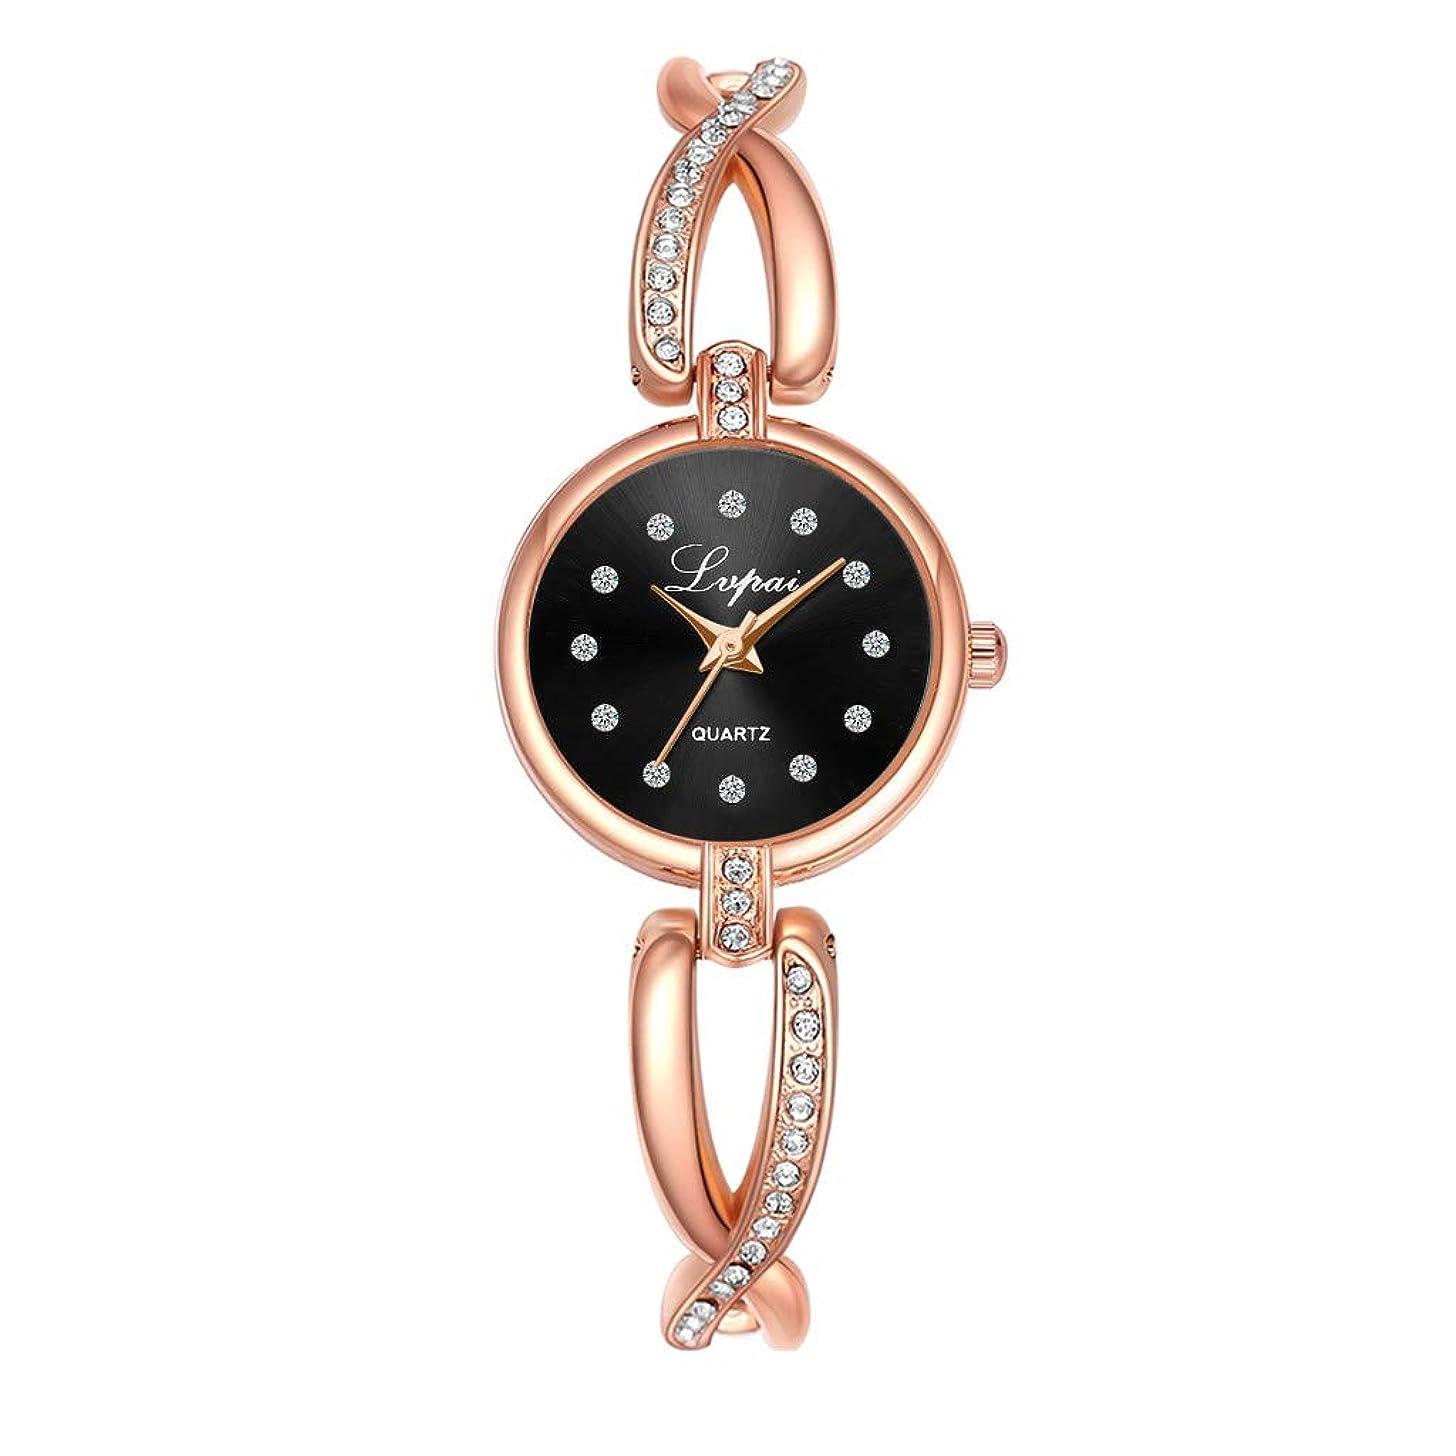 LUCAMORE Womens Fashion Analog Quartz Bangle Cuff Bracelet Wrist Watch Elegant Crystal Stainless Steel Wire Band